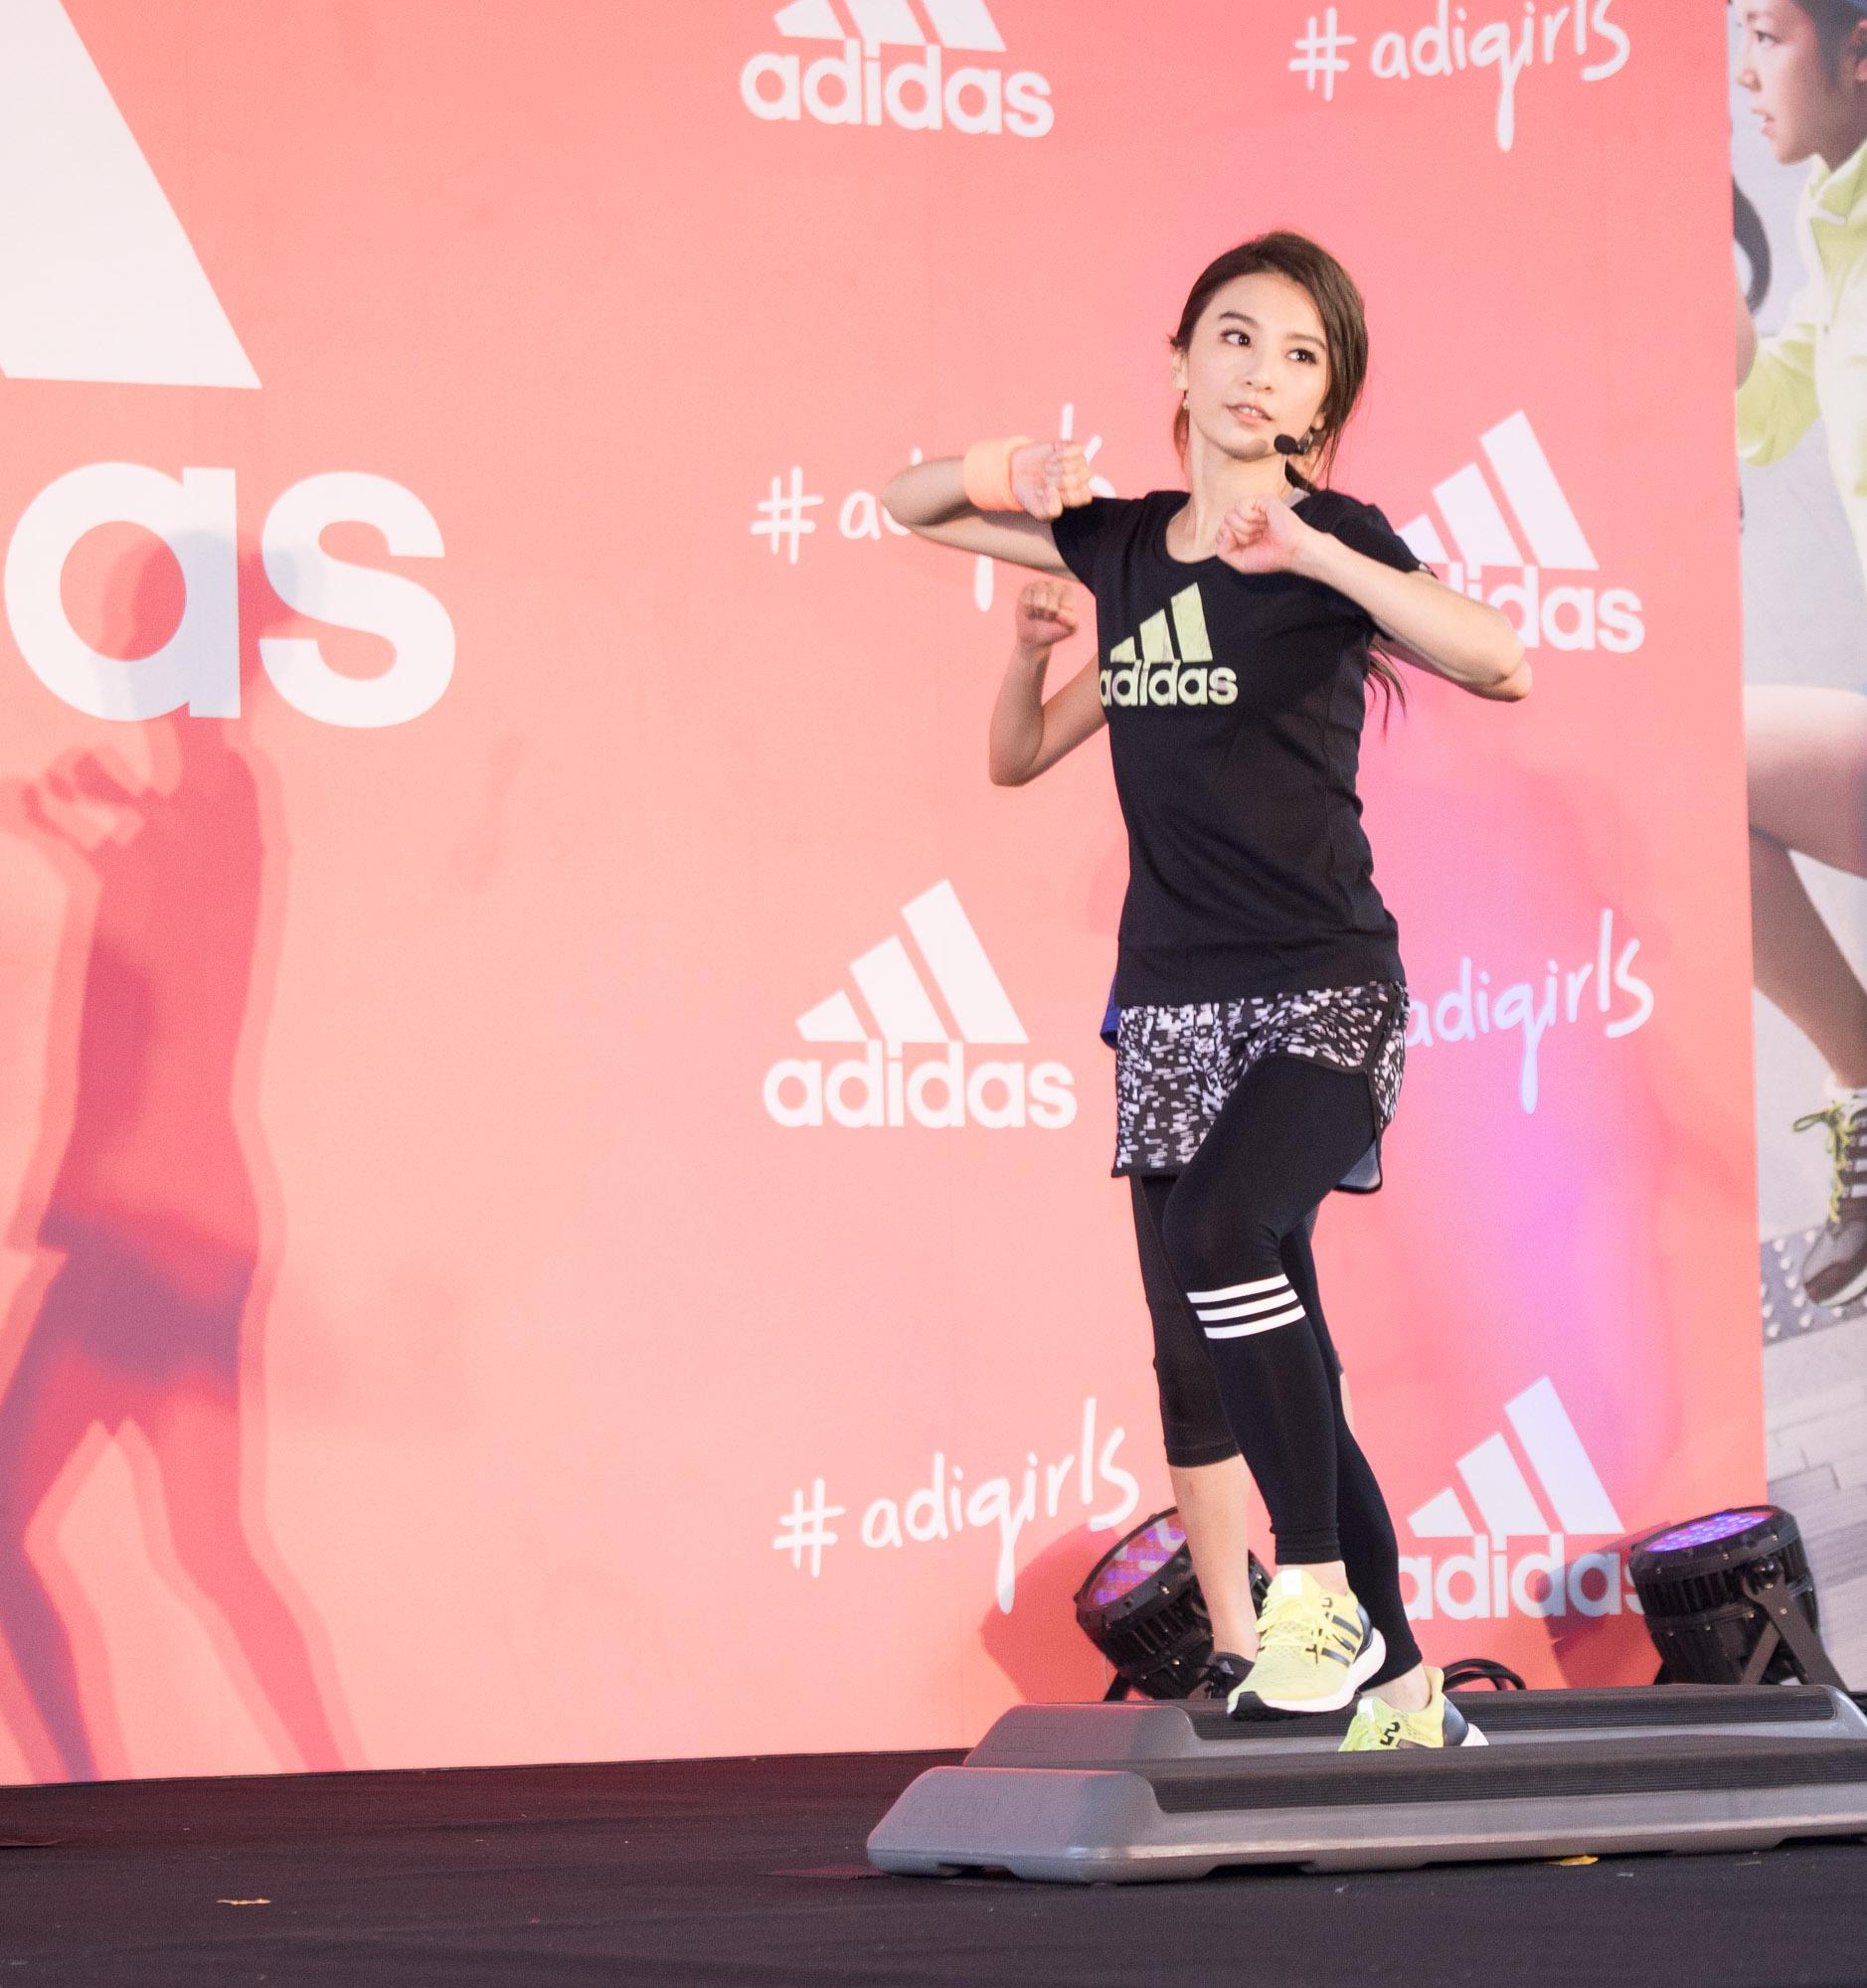 adidas-adigirls press conference 20150924-4